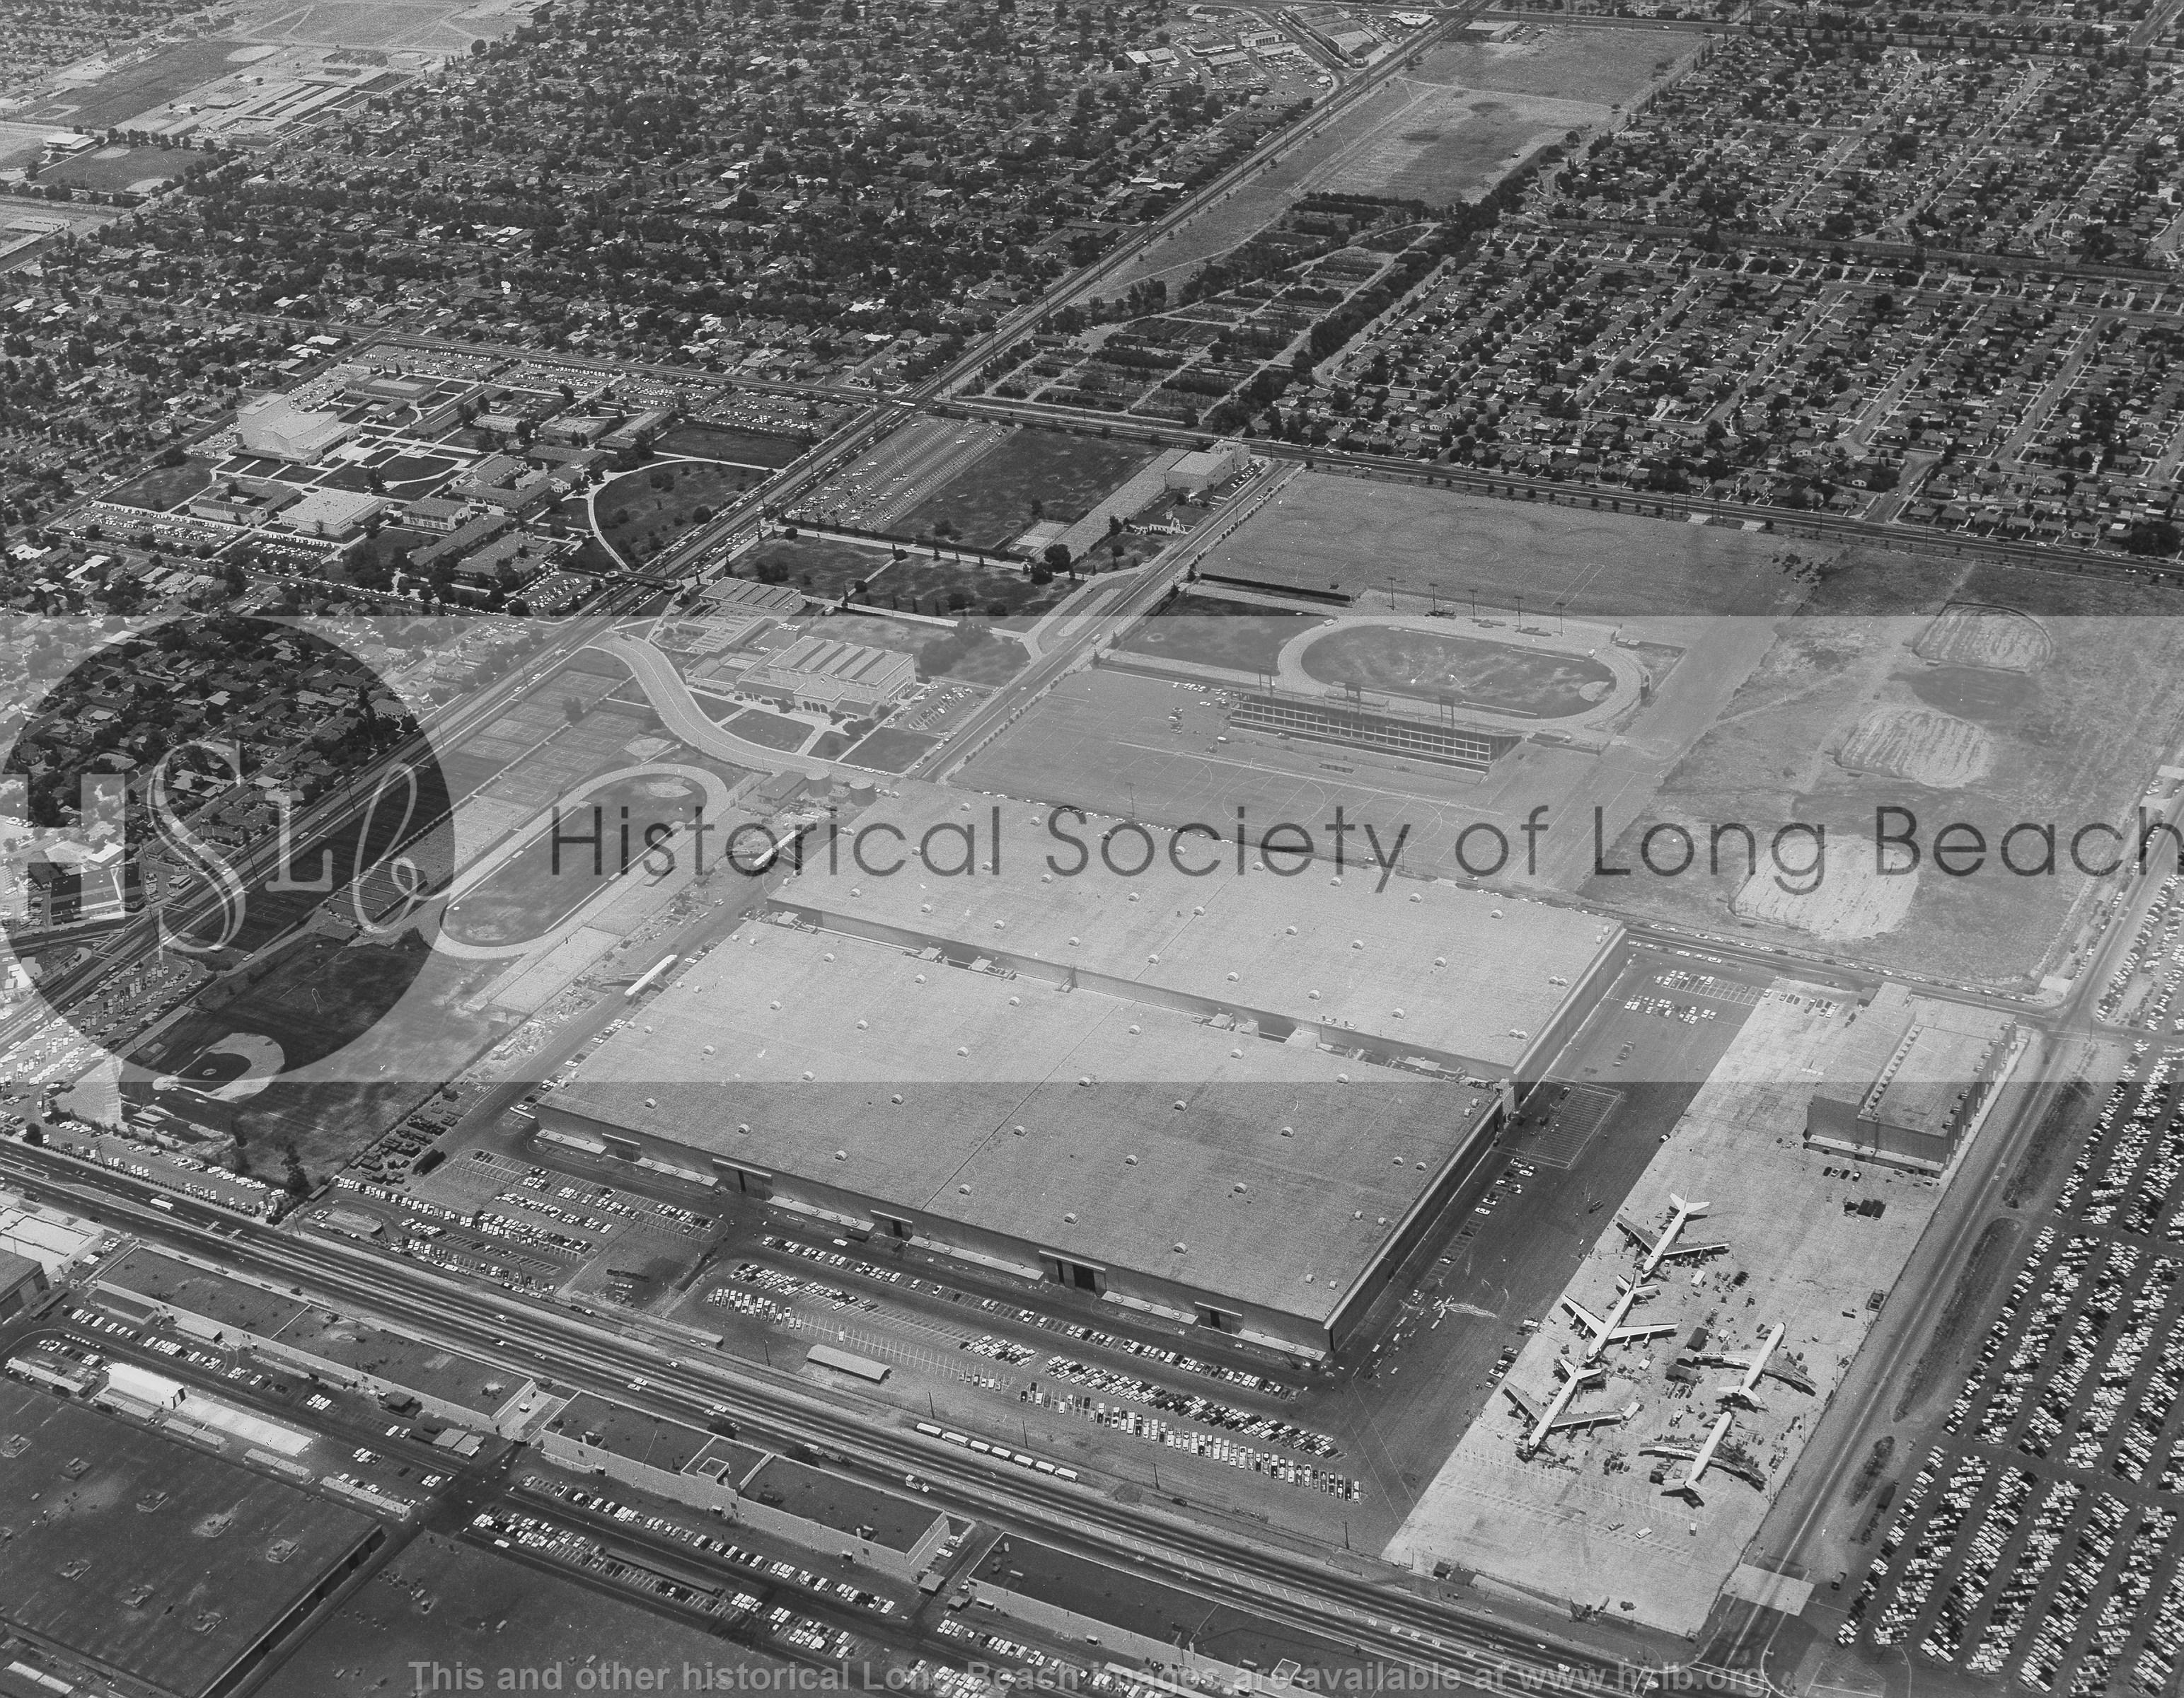 McDonnell Douglas aerial, 1959